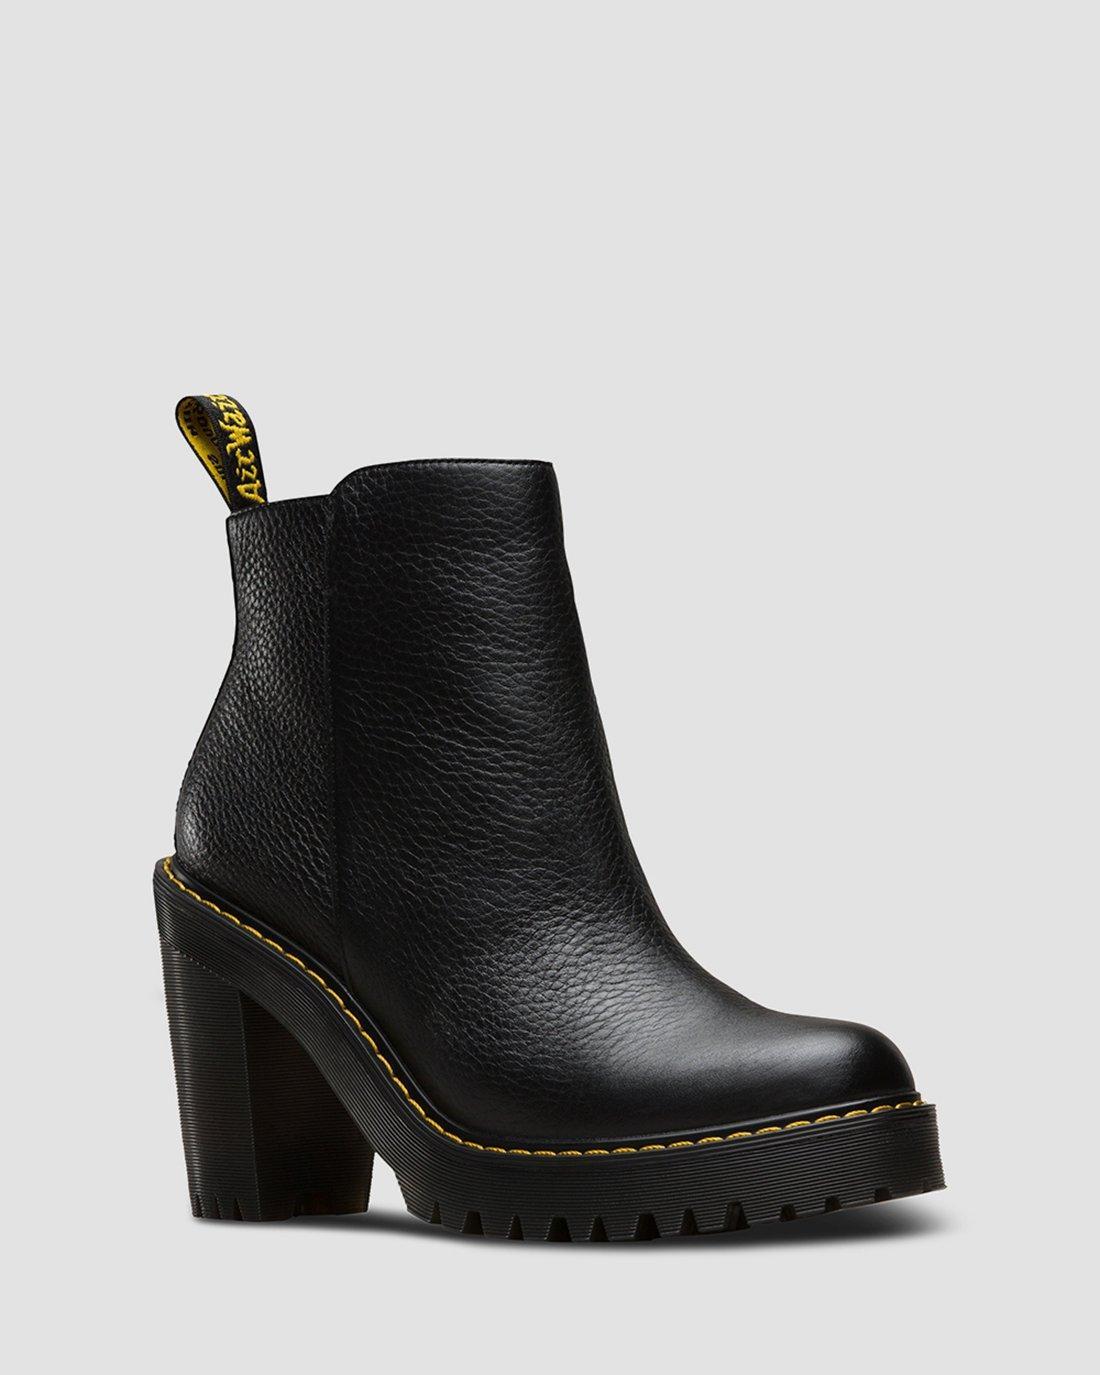 MAGDALENA AUNT SALLY | Women's Footwear